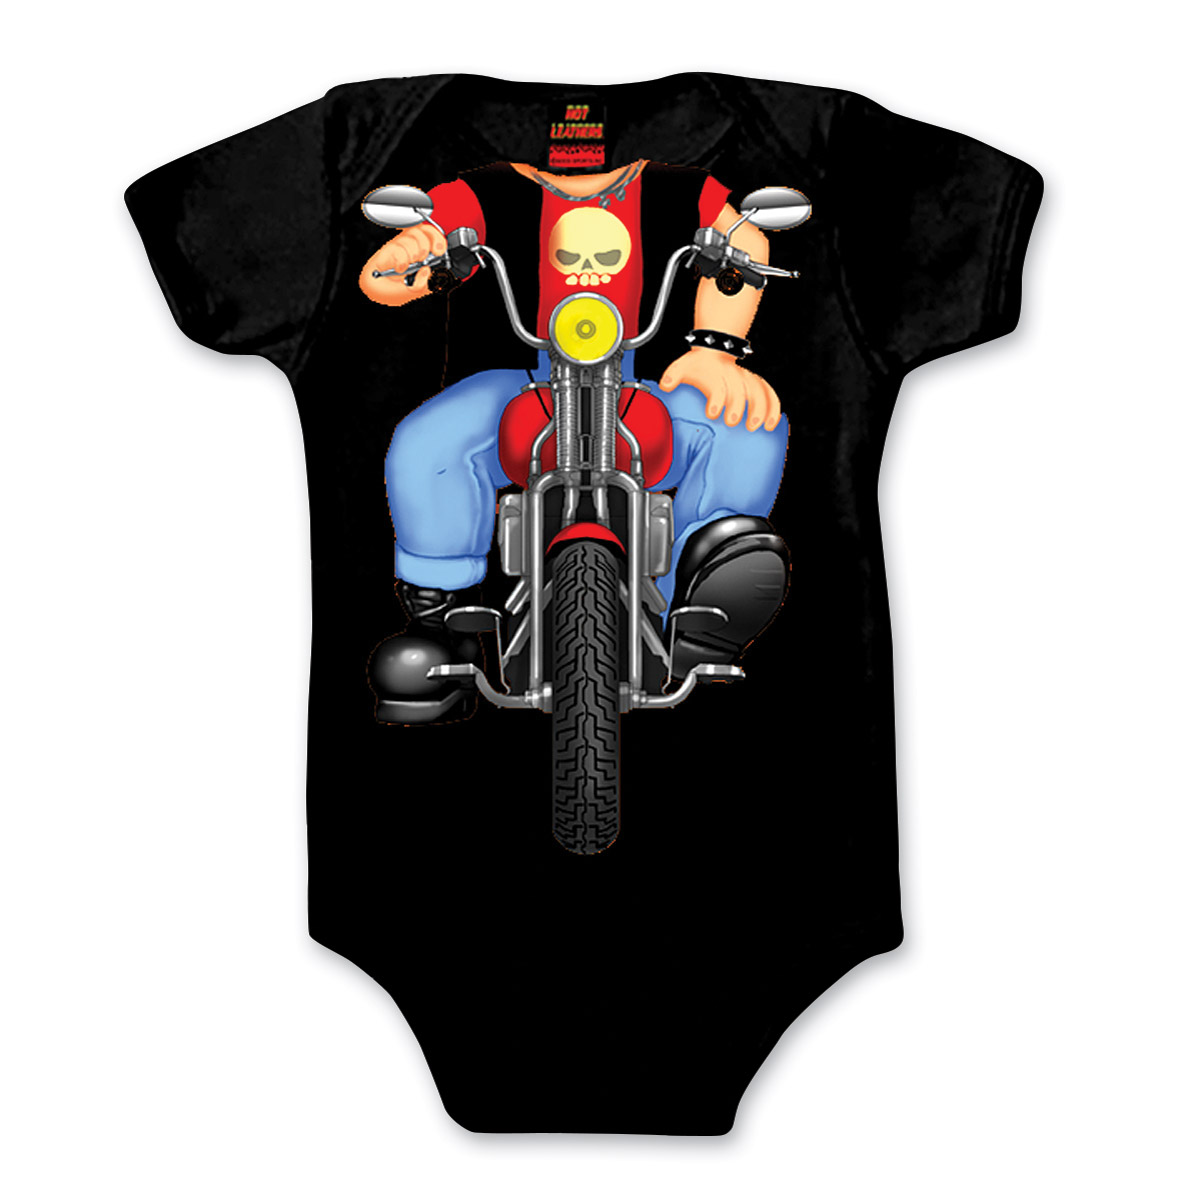 Hot Leathers Boy's Grown Up Biker Boy Black Onesie